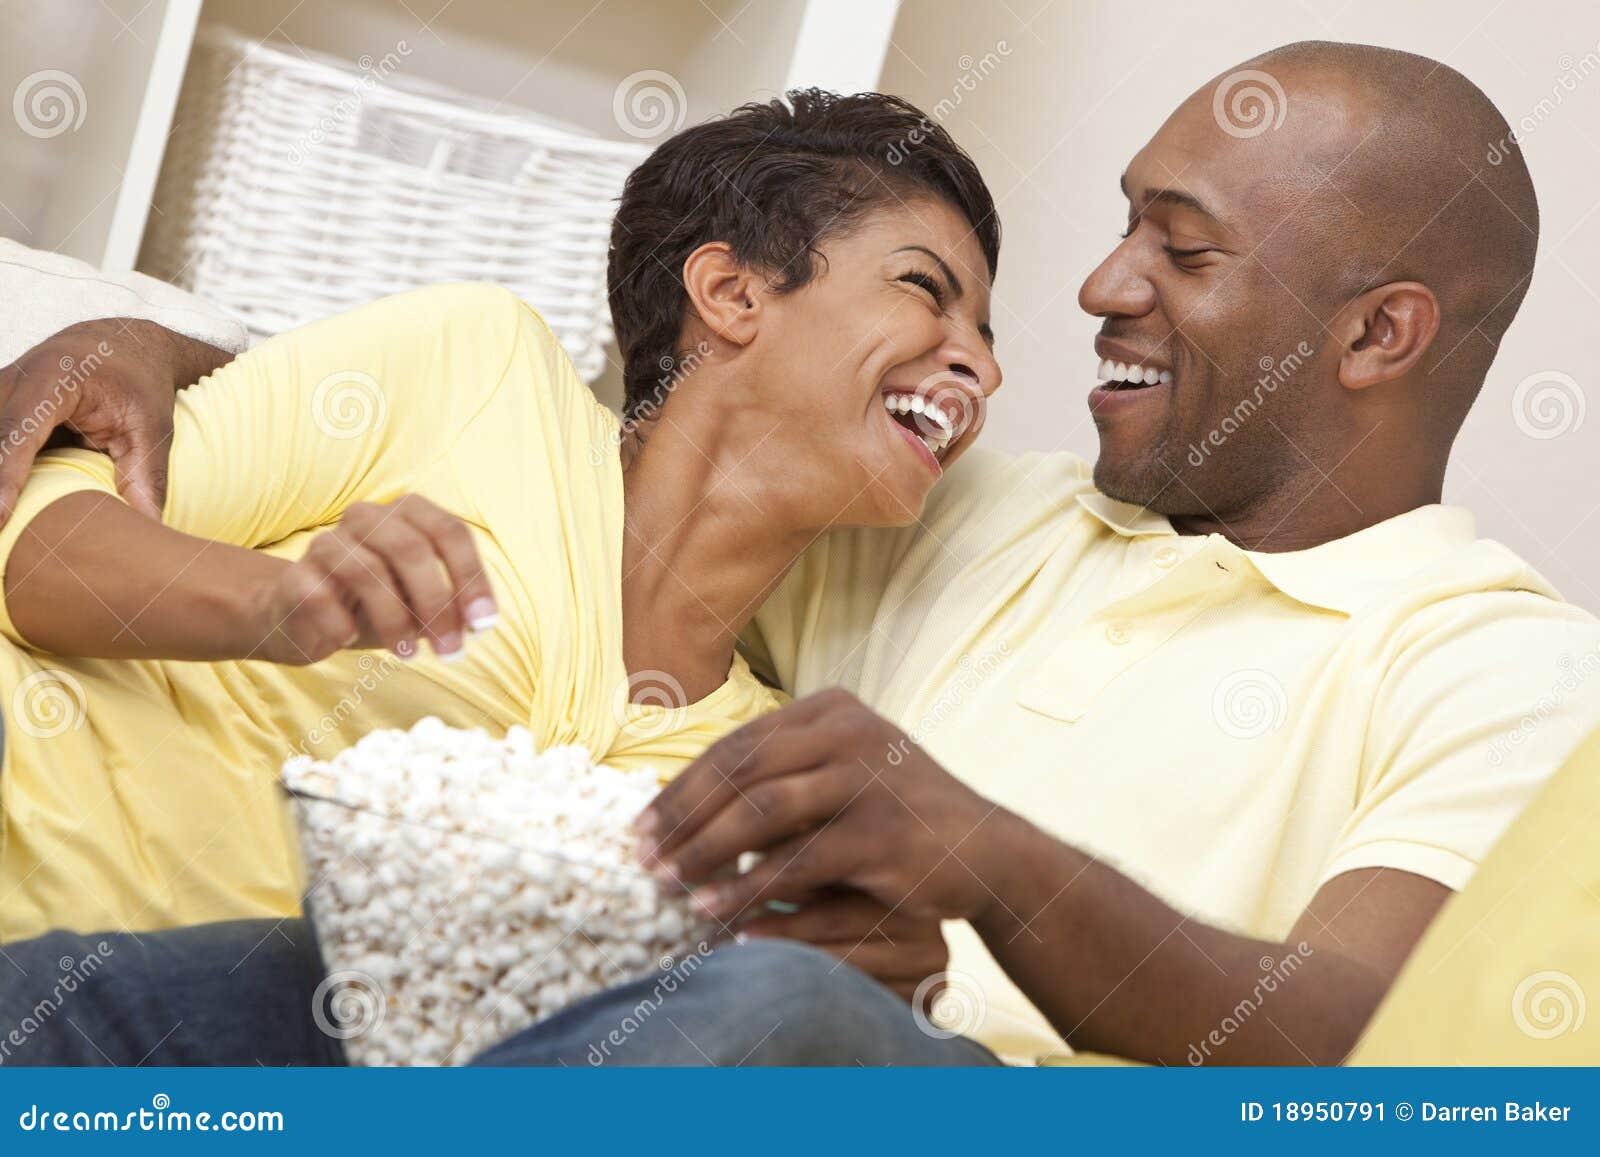 namorando ou solteiro télécharger des films